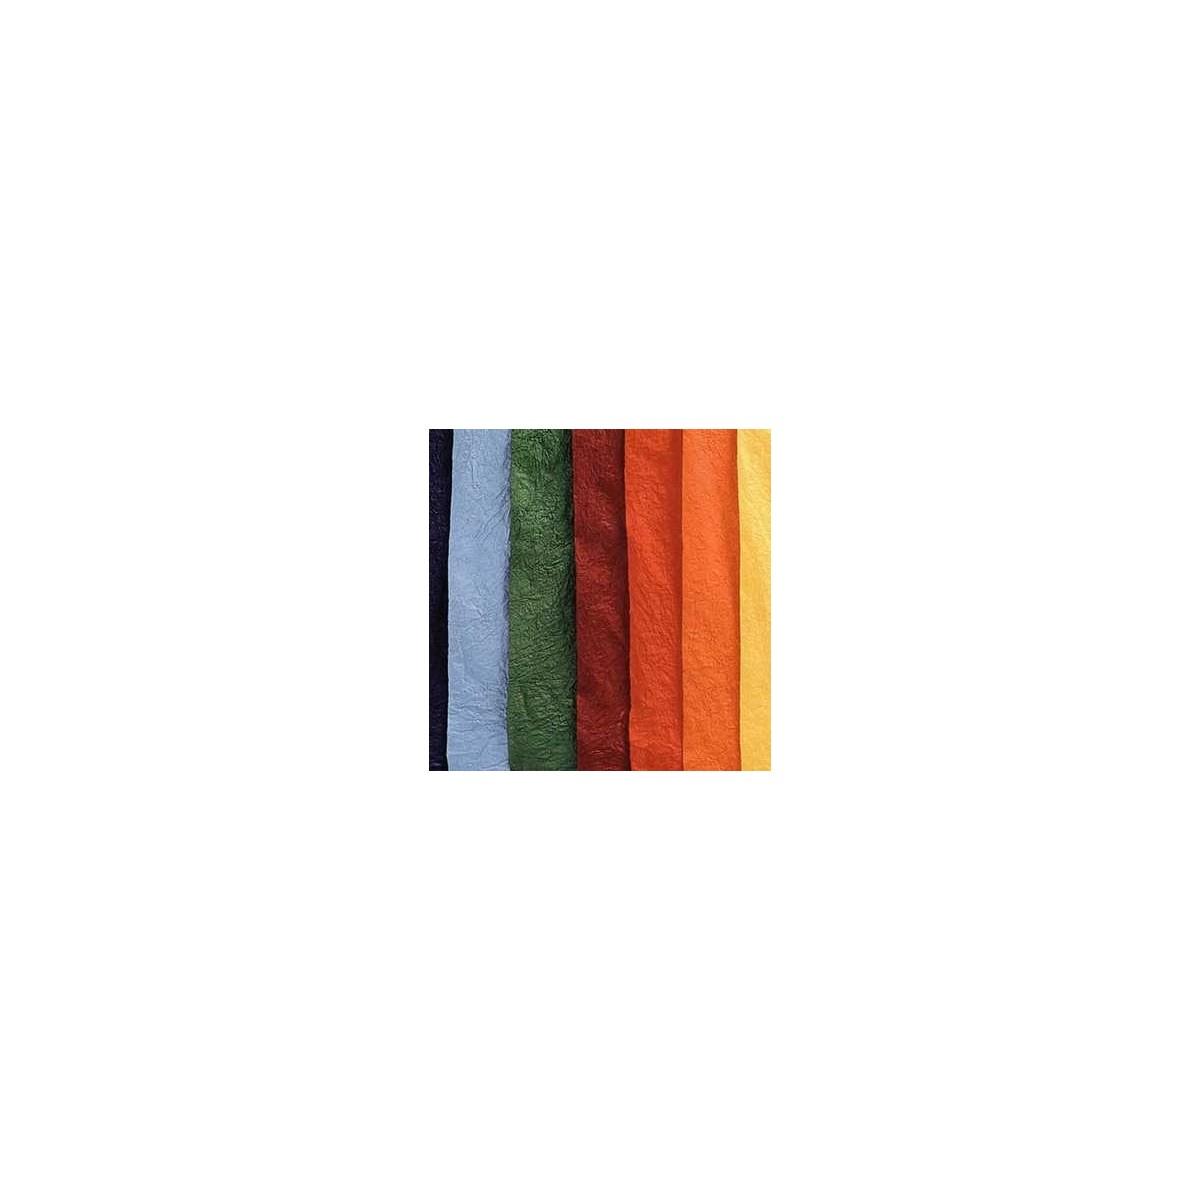 Fogli di Carta AVOHA Cm.55x80 Gr.50